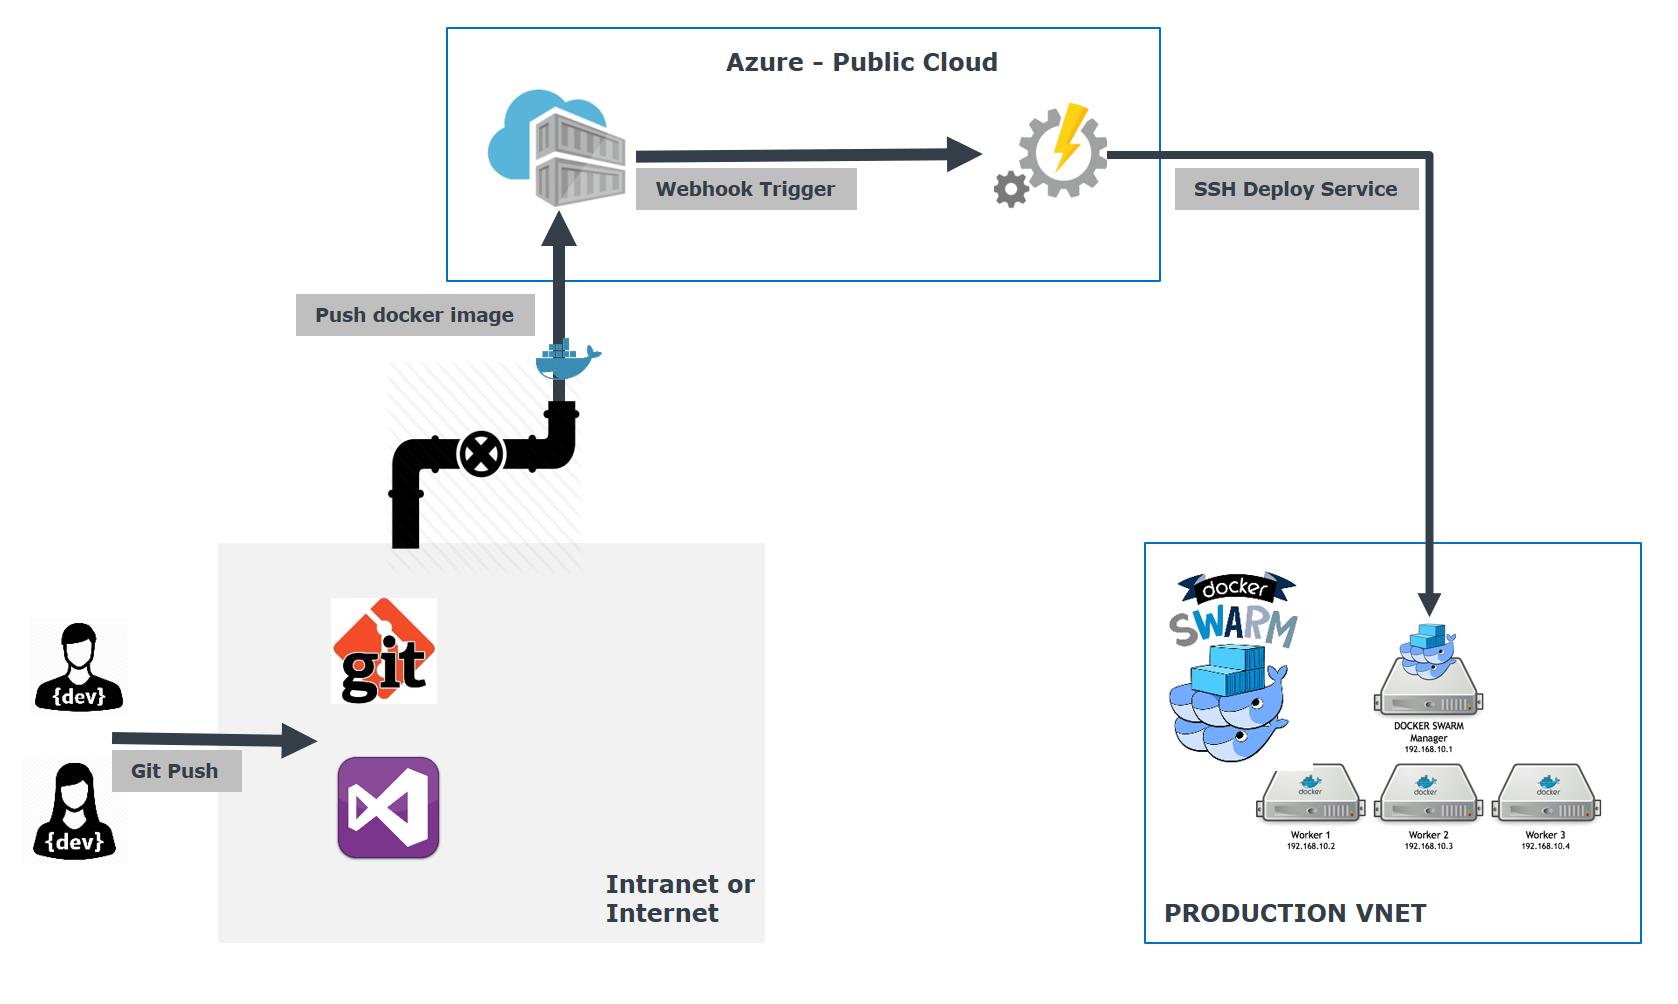 GitHub - MoimHossain/swarm-service-deploy: An Azure runbook that